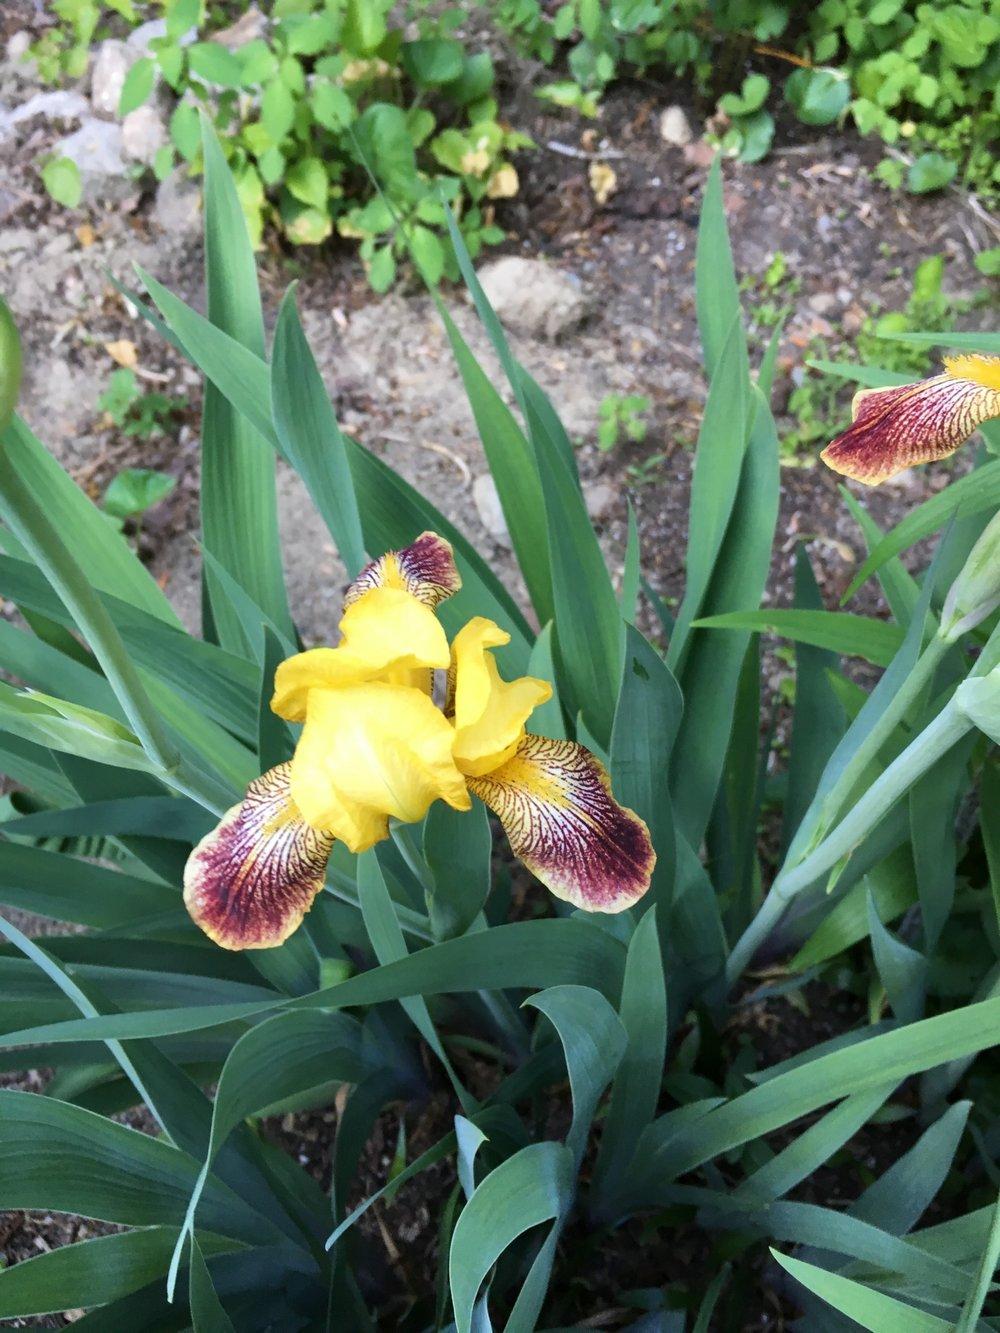 Yellow and red Bearded Iris